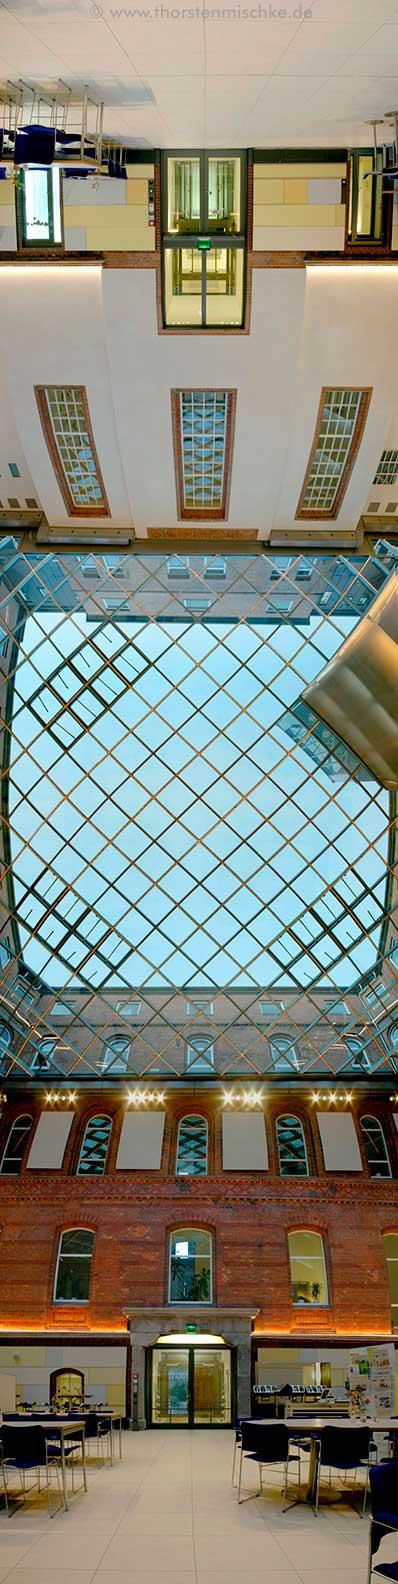 Foto: Landeshaus Kiel-Nordhof Ost-West-Achse © www.ThorstenMischke.de Fotodesign Kiel